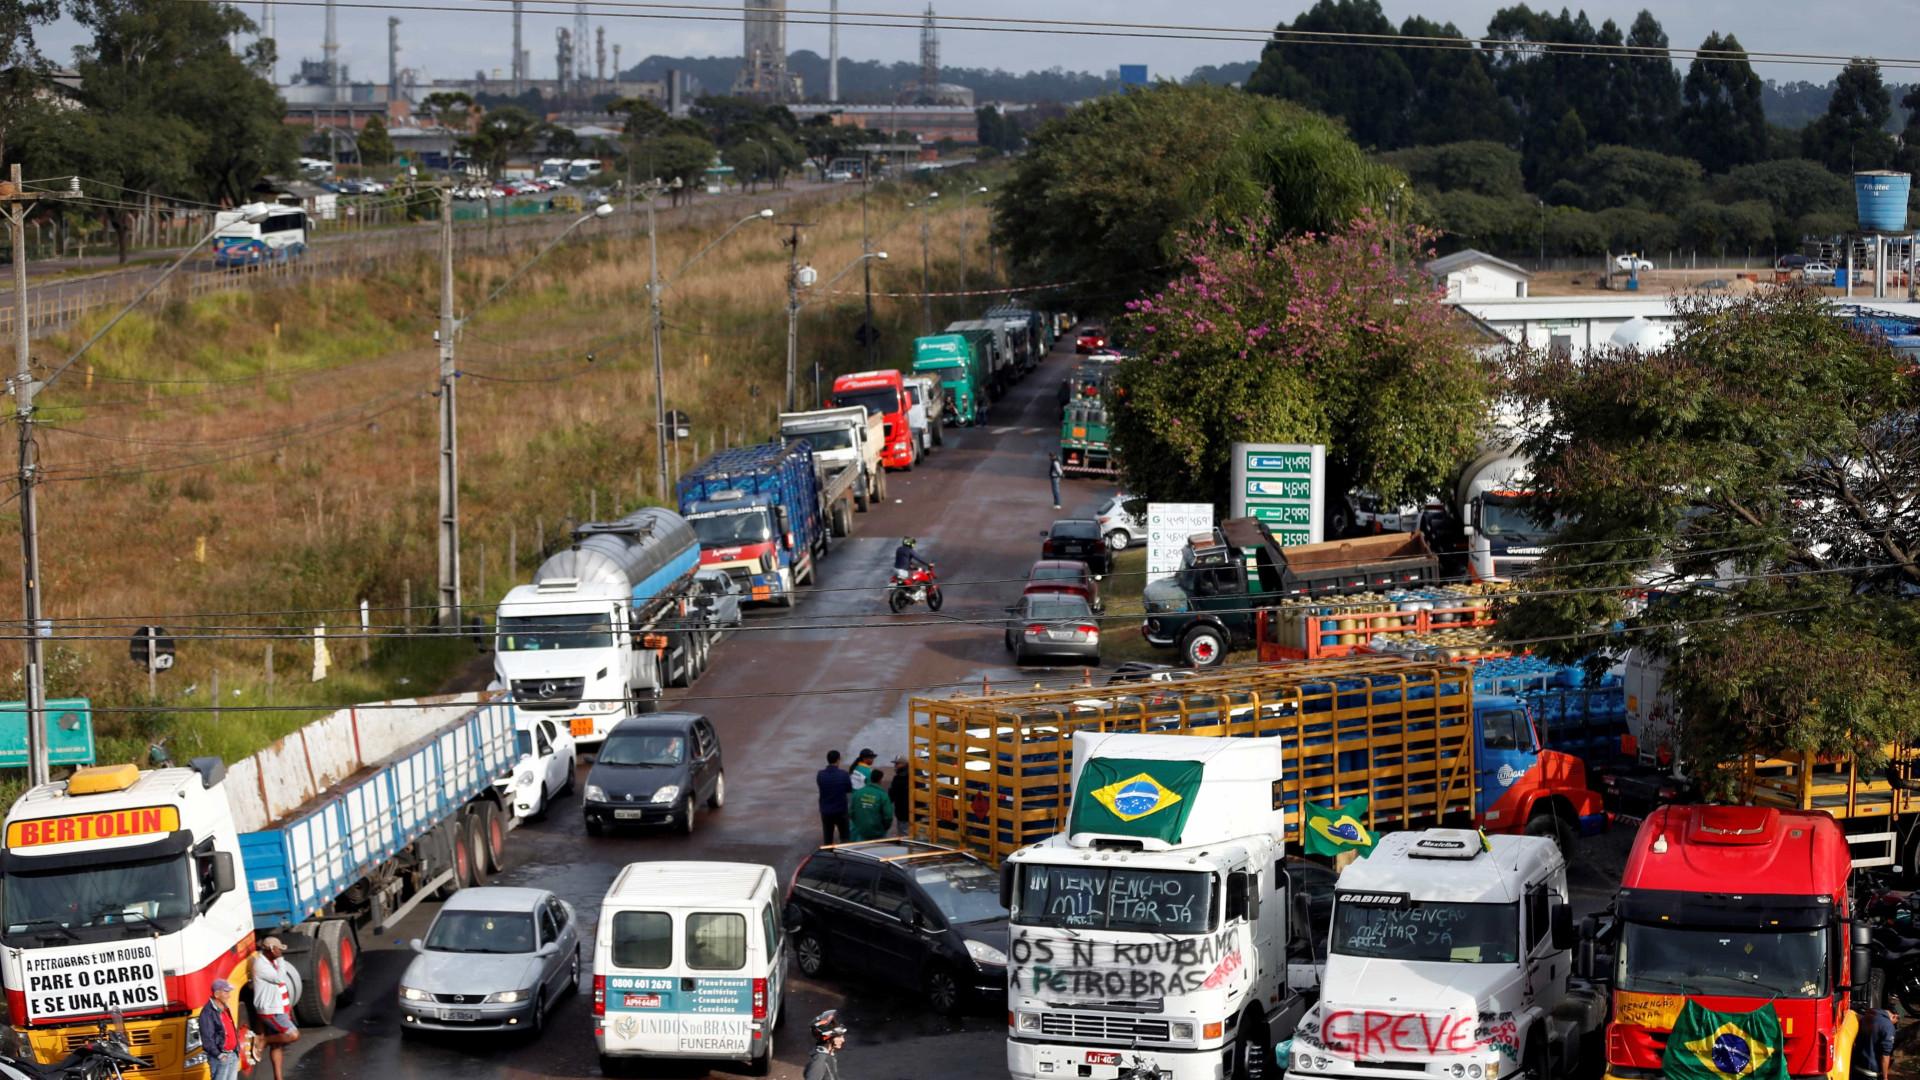 Em Brasília, sindicato alerta que cerveja deve acabar em 48h